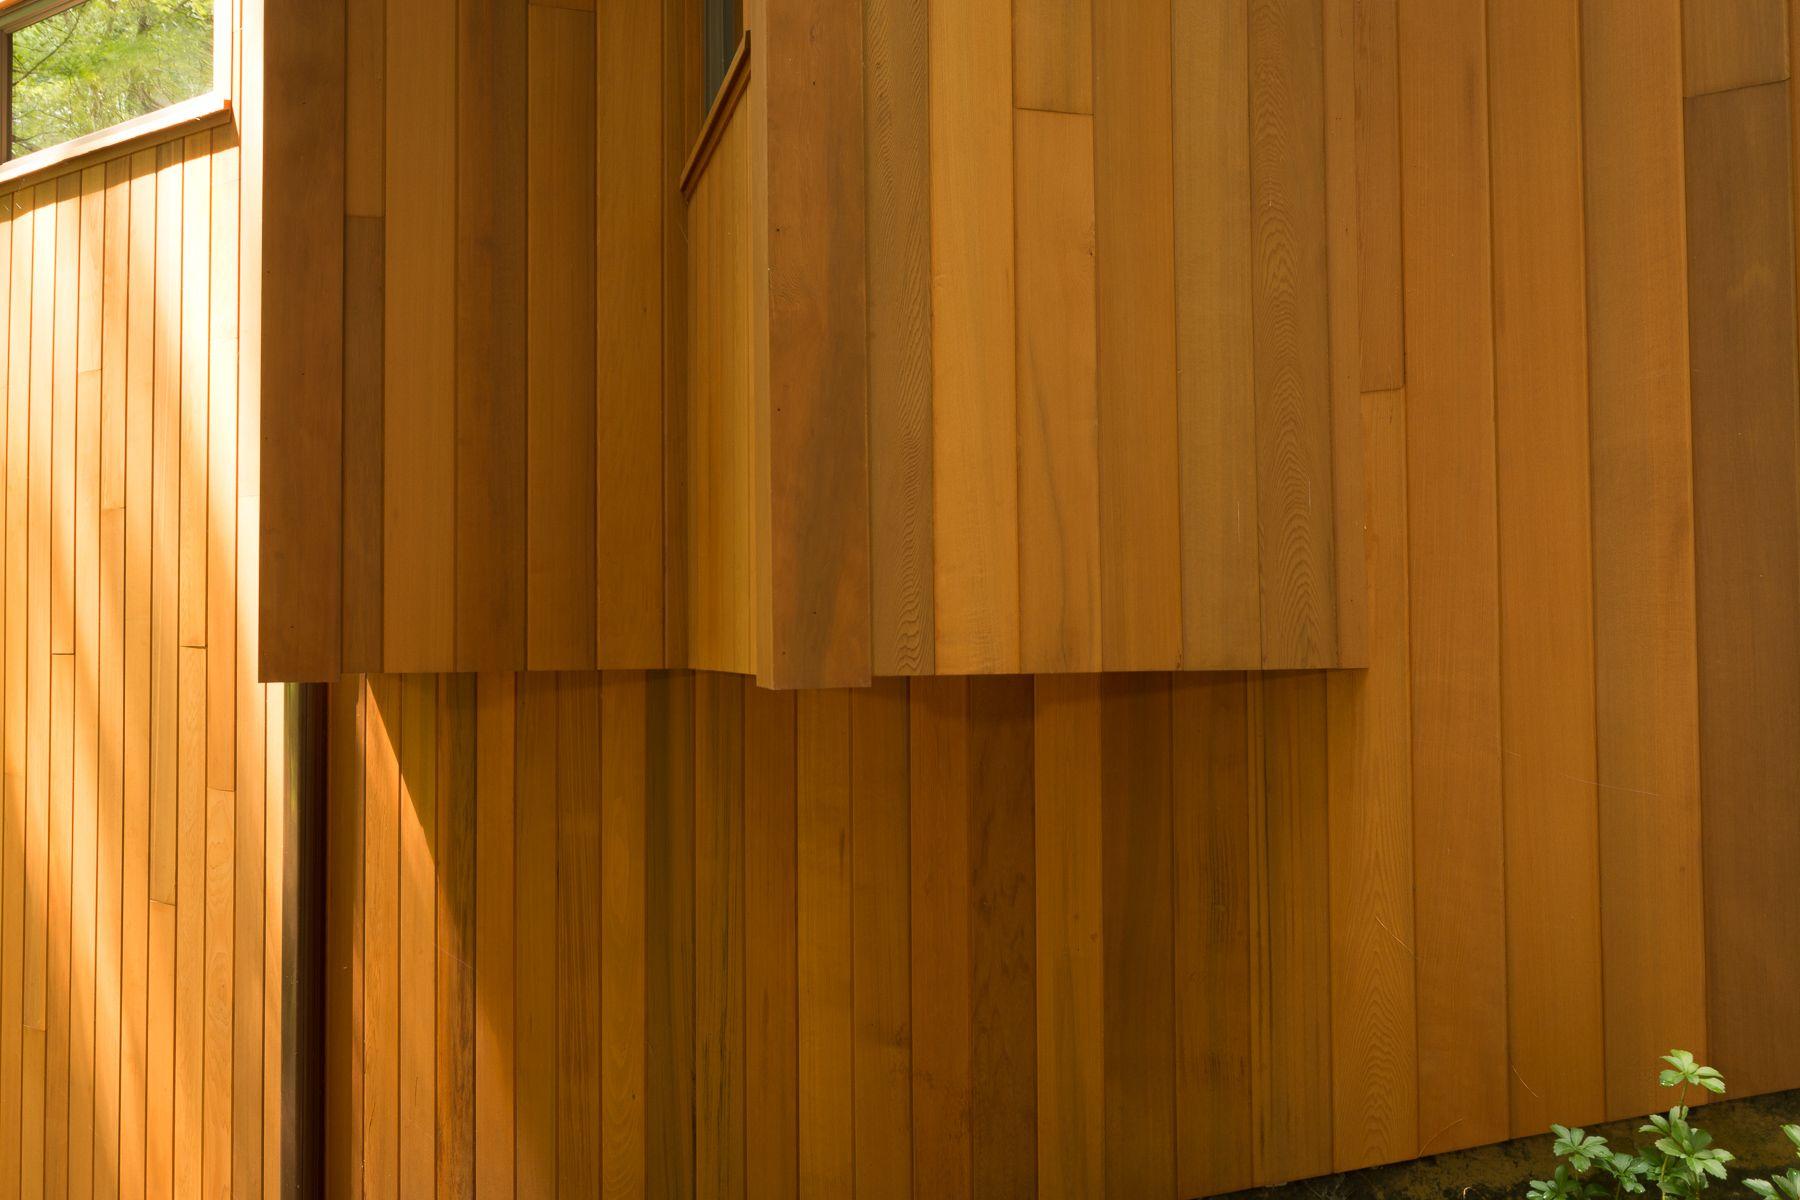 1x6 12 D Grade 117 Siding Wood Pattern Siding Wood Siding Southern Pine Wood Siding Types